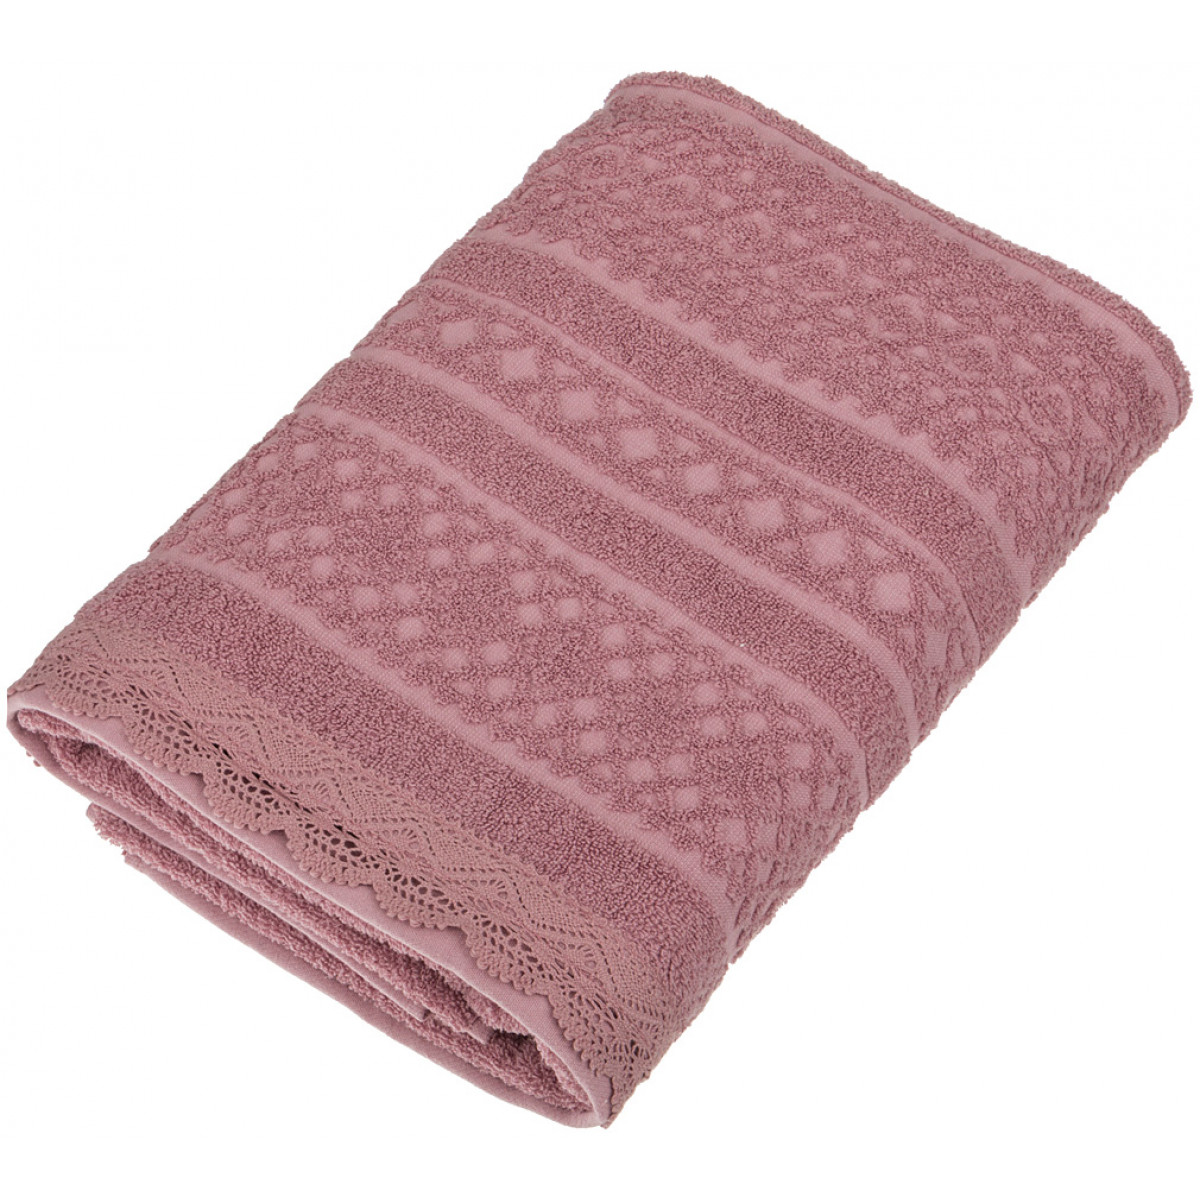 Полотенца Santalino Полотенце Keila (70х140 см) полотенца tango полотенце stevania 70х140 см